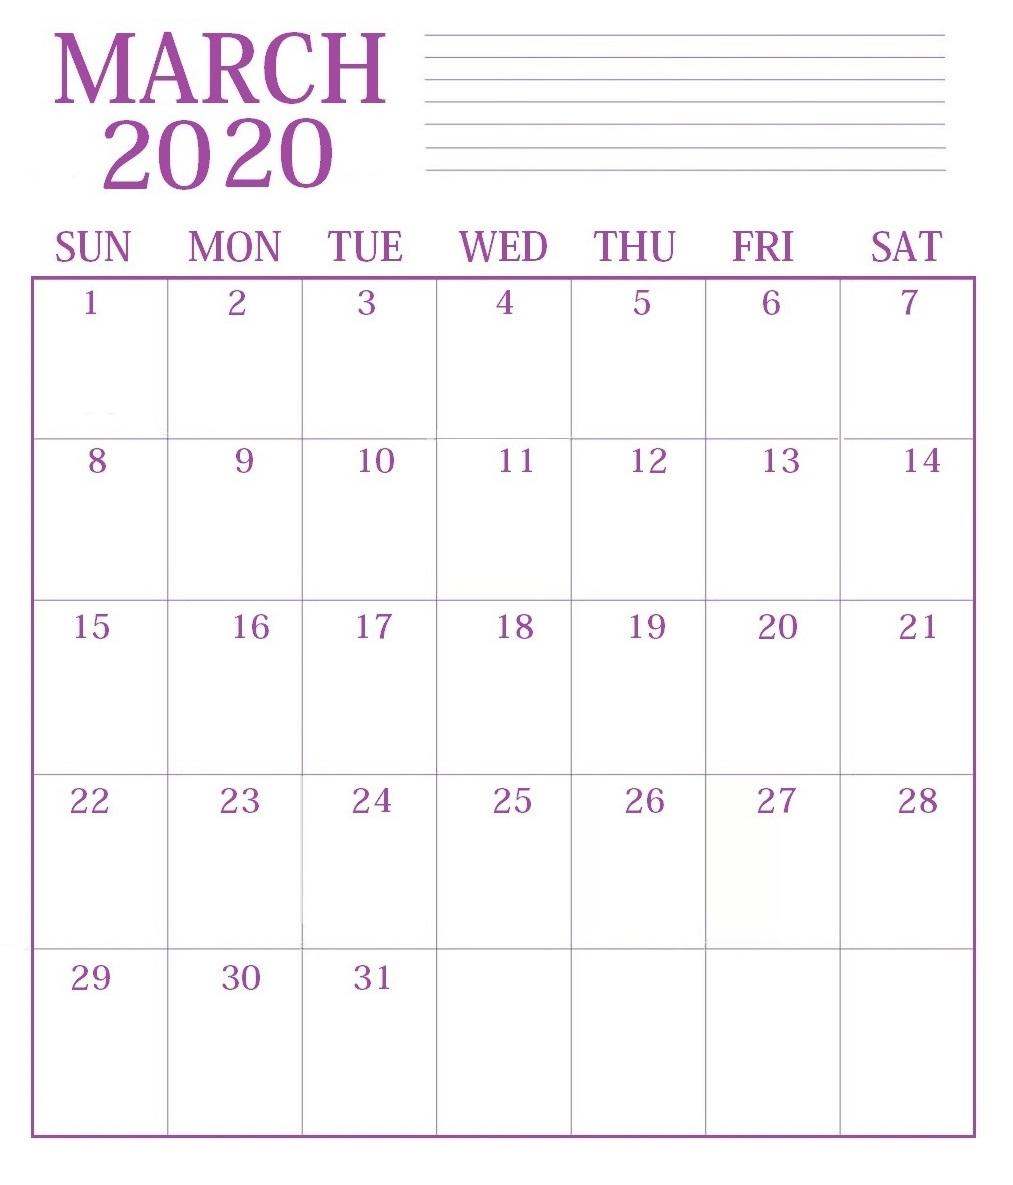 Print March 2020 Blank Calendar